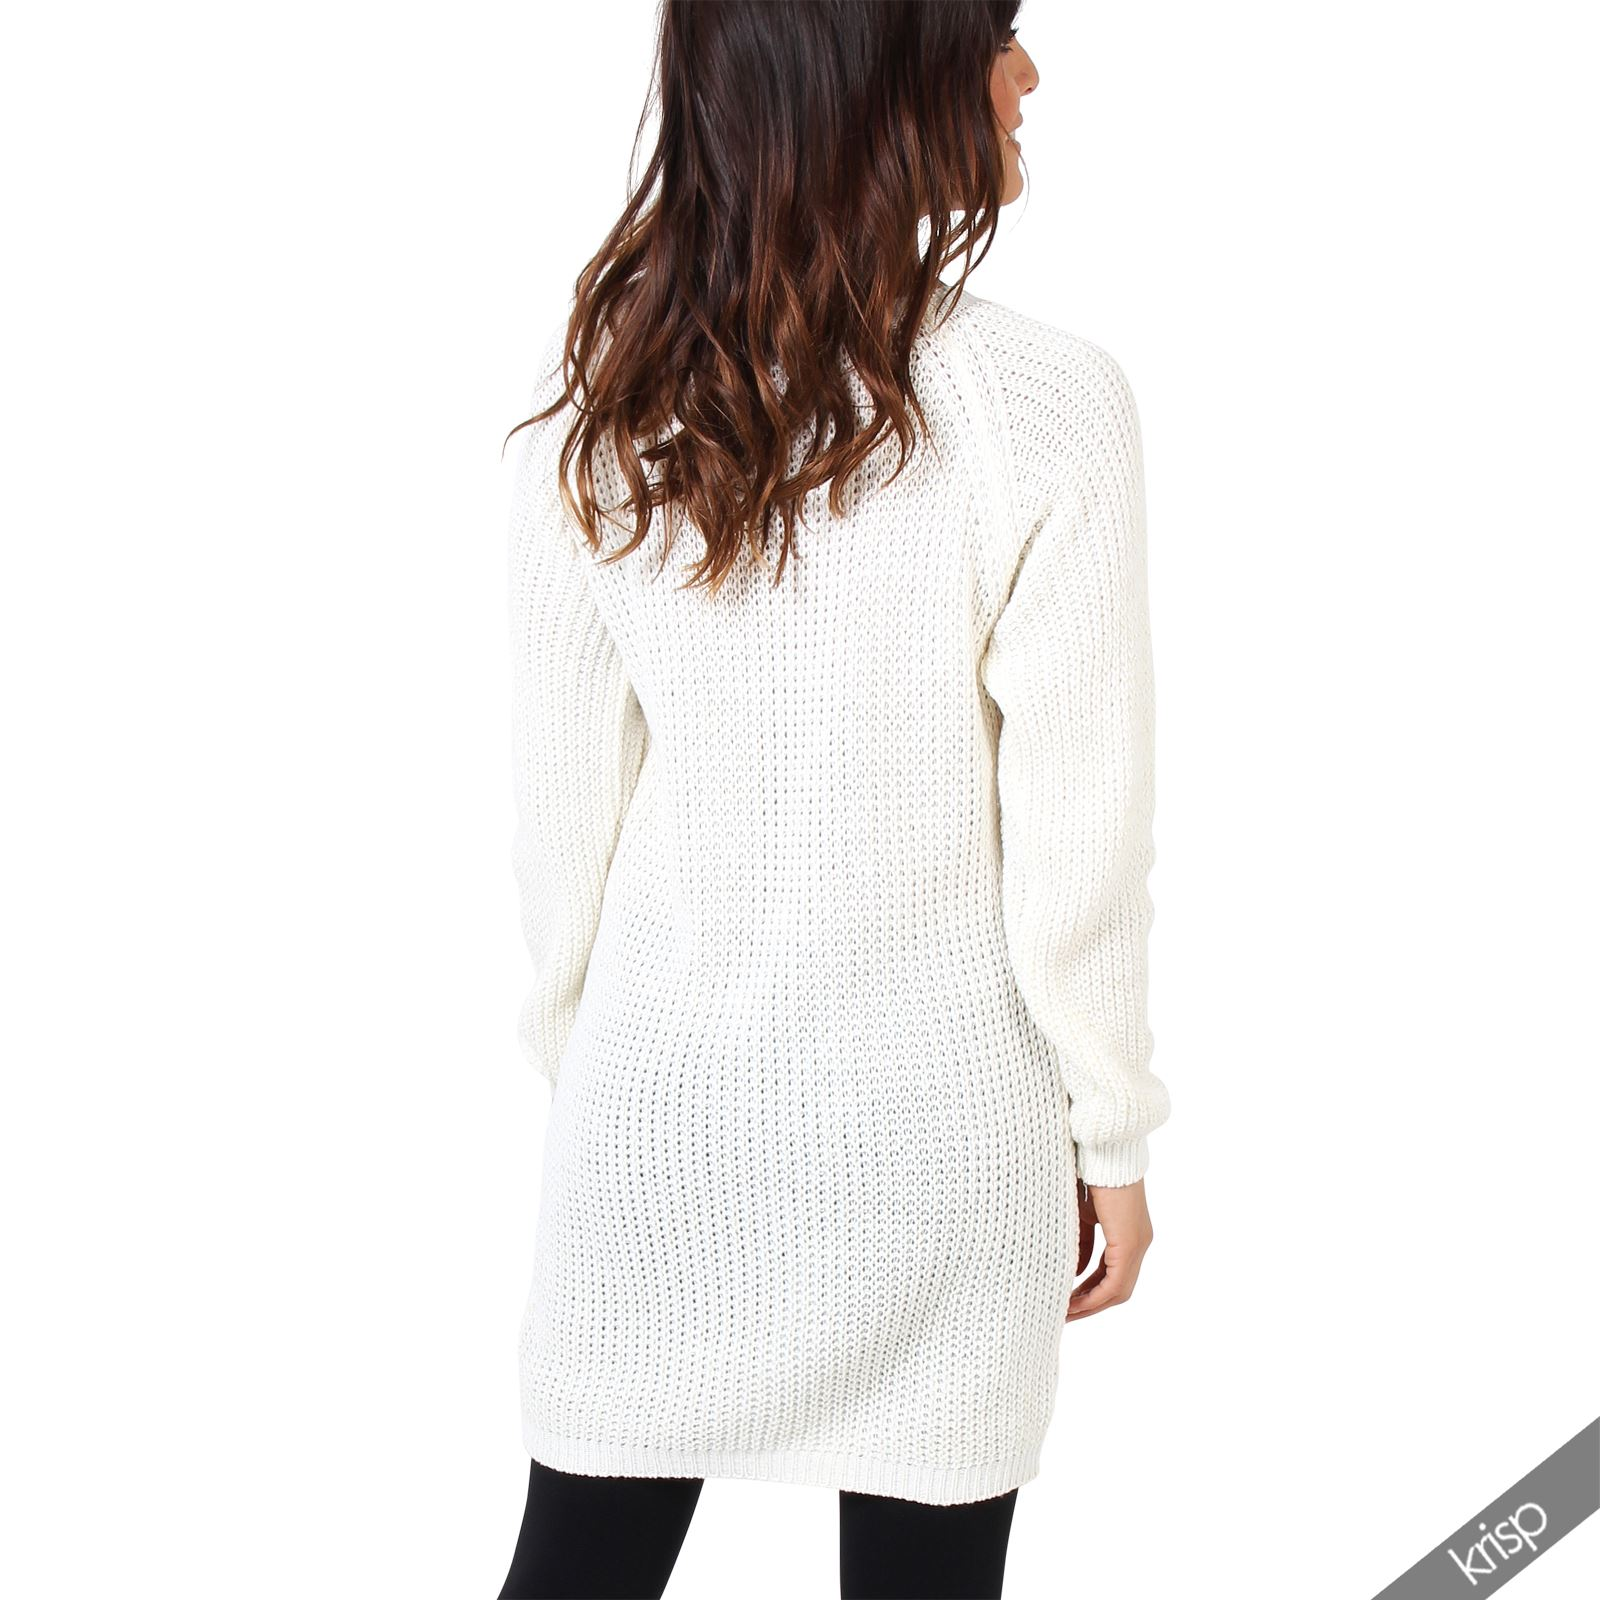 women lurex cable knit oversize boyfriend long sweater jumper dress pullover top ebay. Black Bedroom Furniture Sets. Home Design Ideas